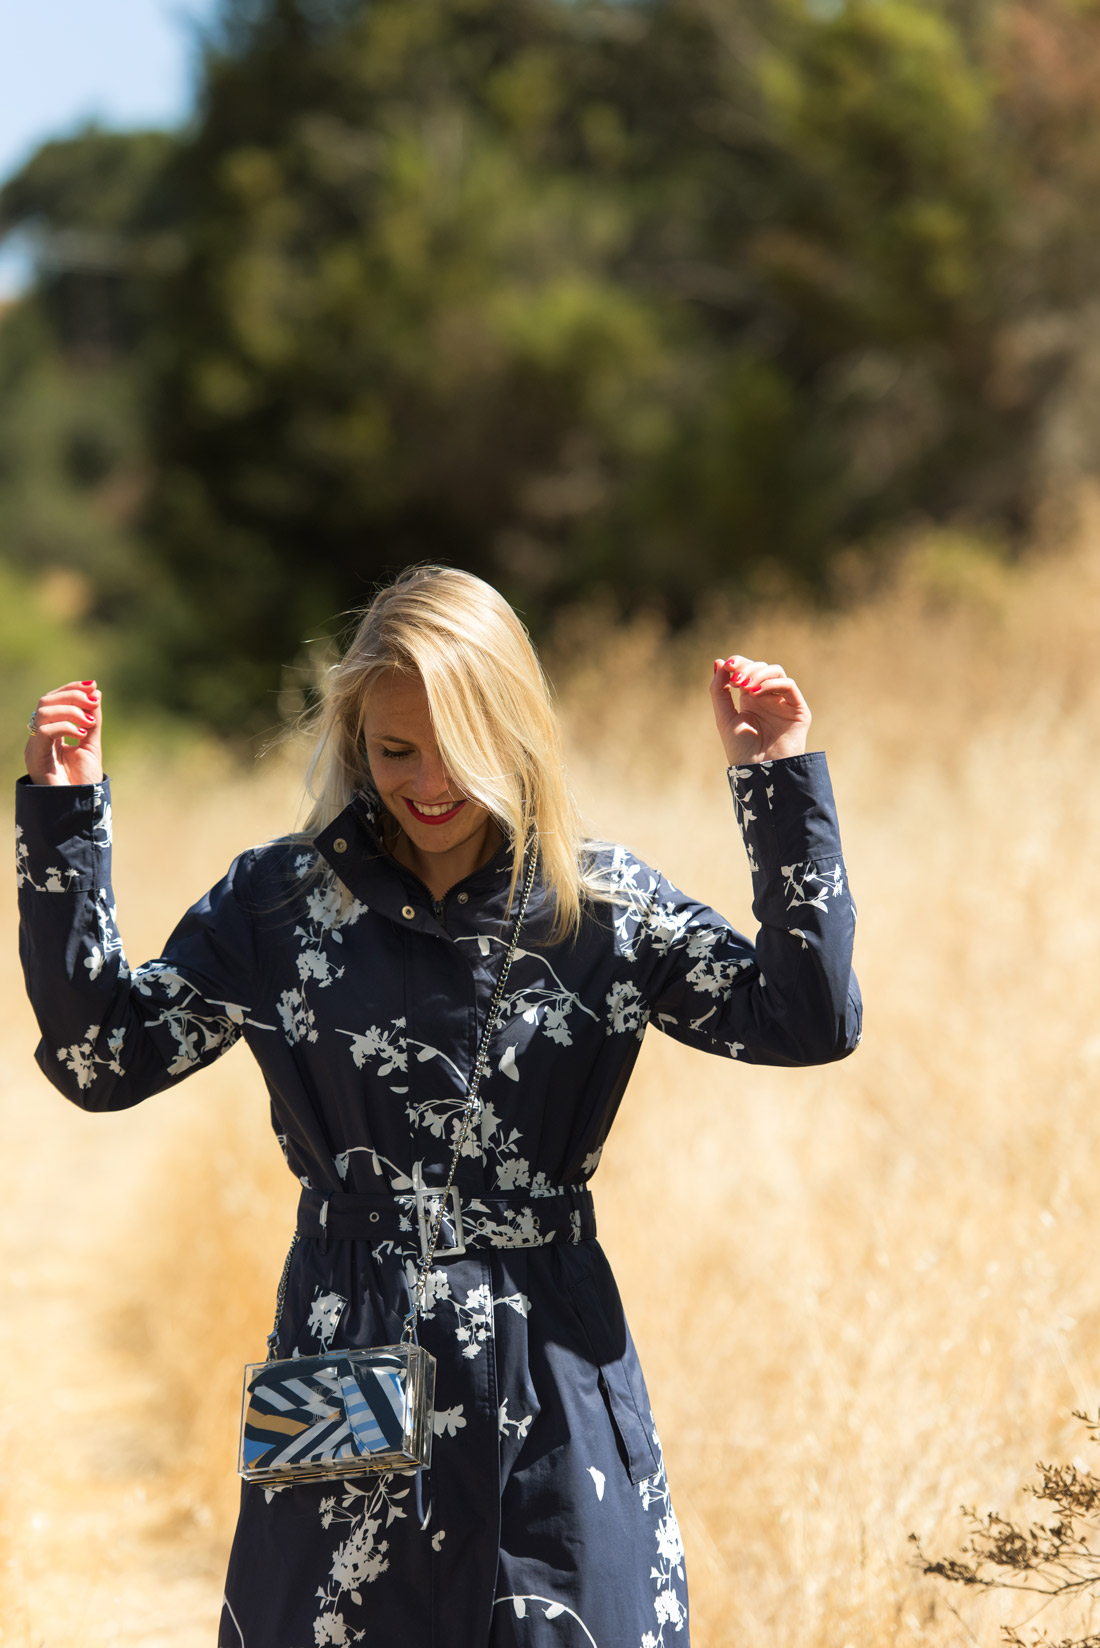 Bag-at-you---Travel-blog---California-girl